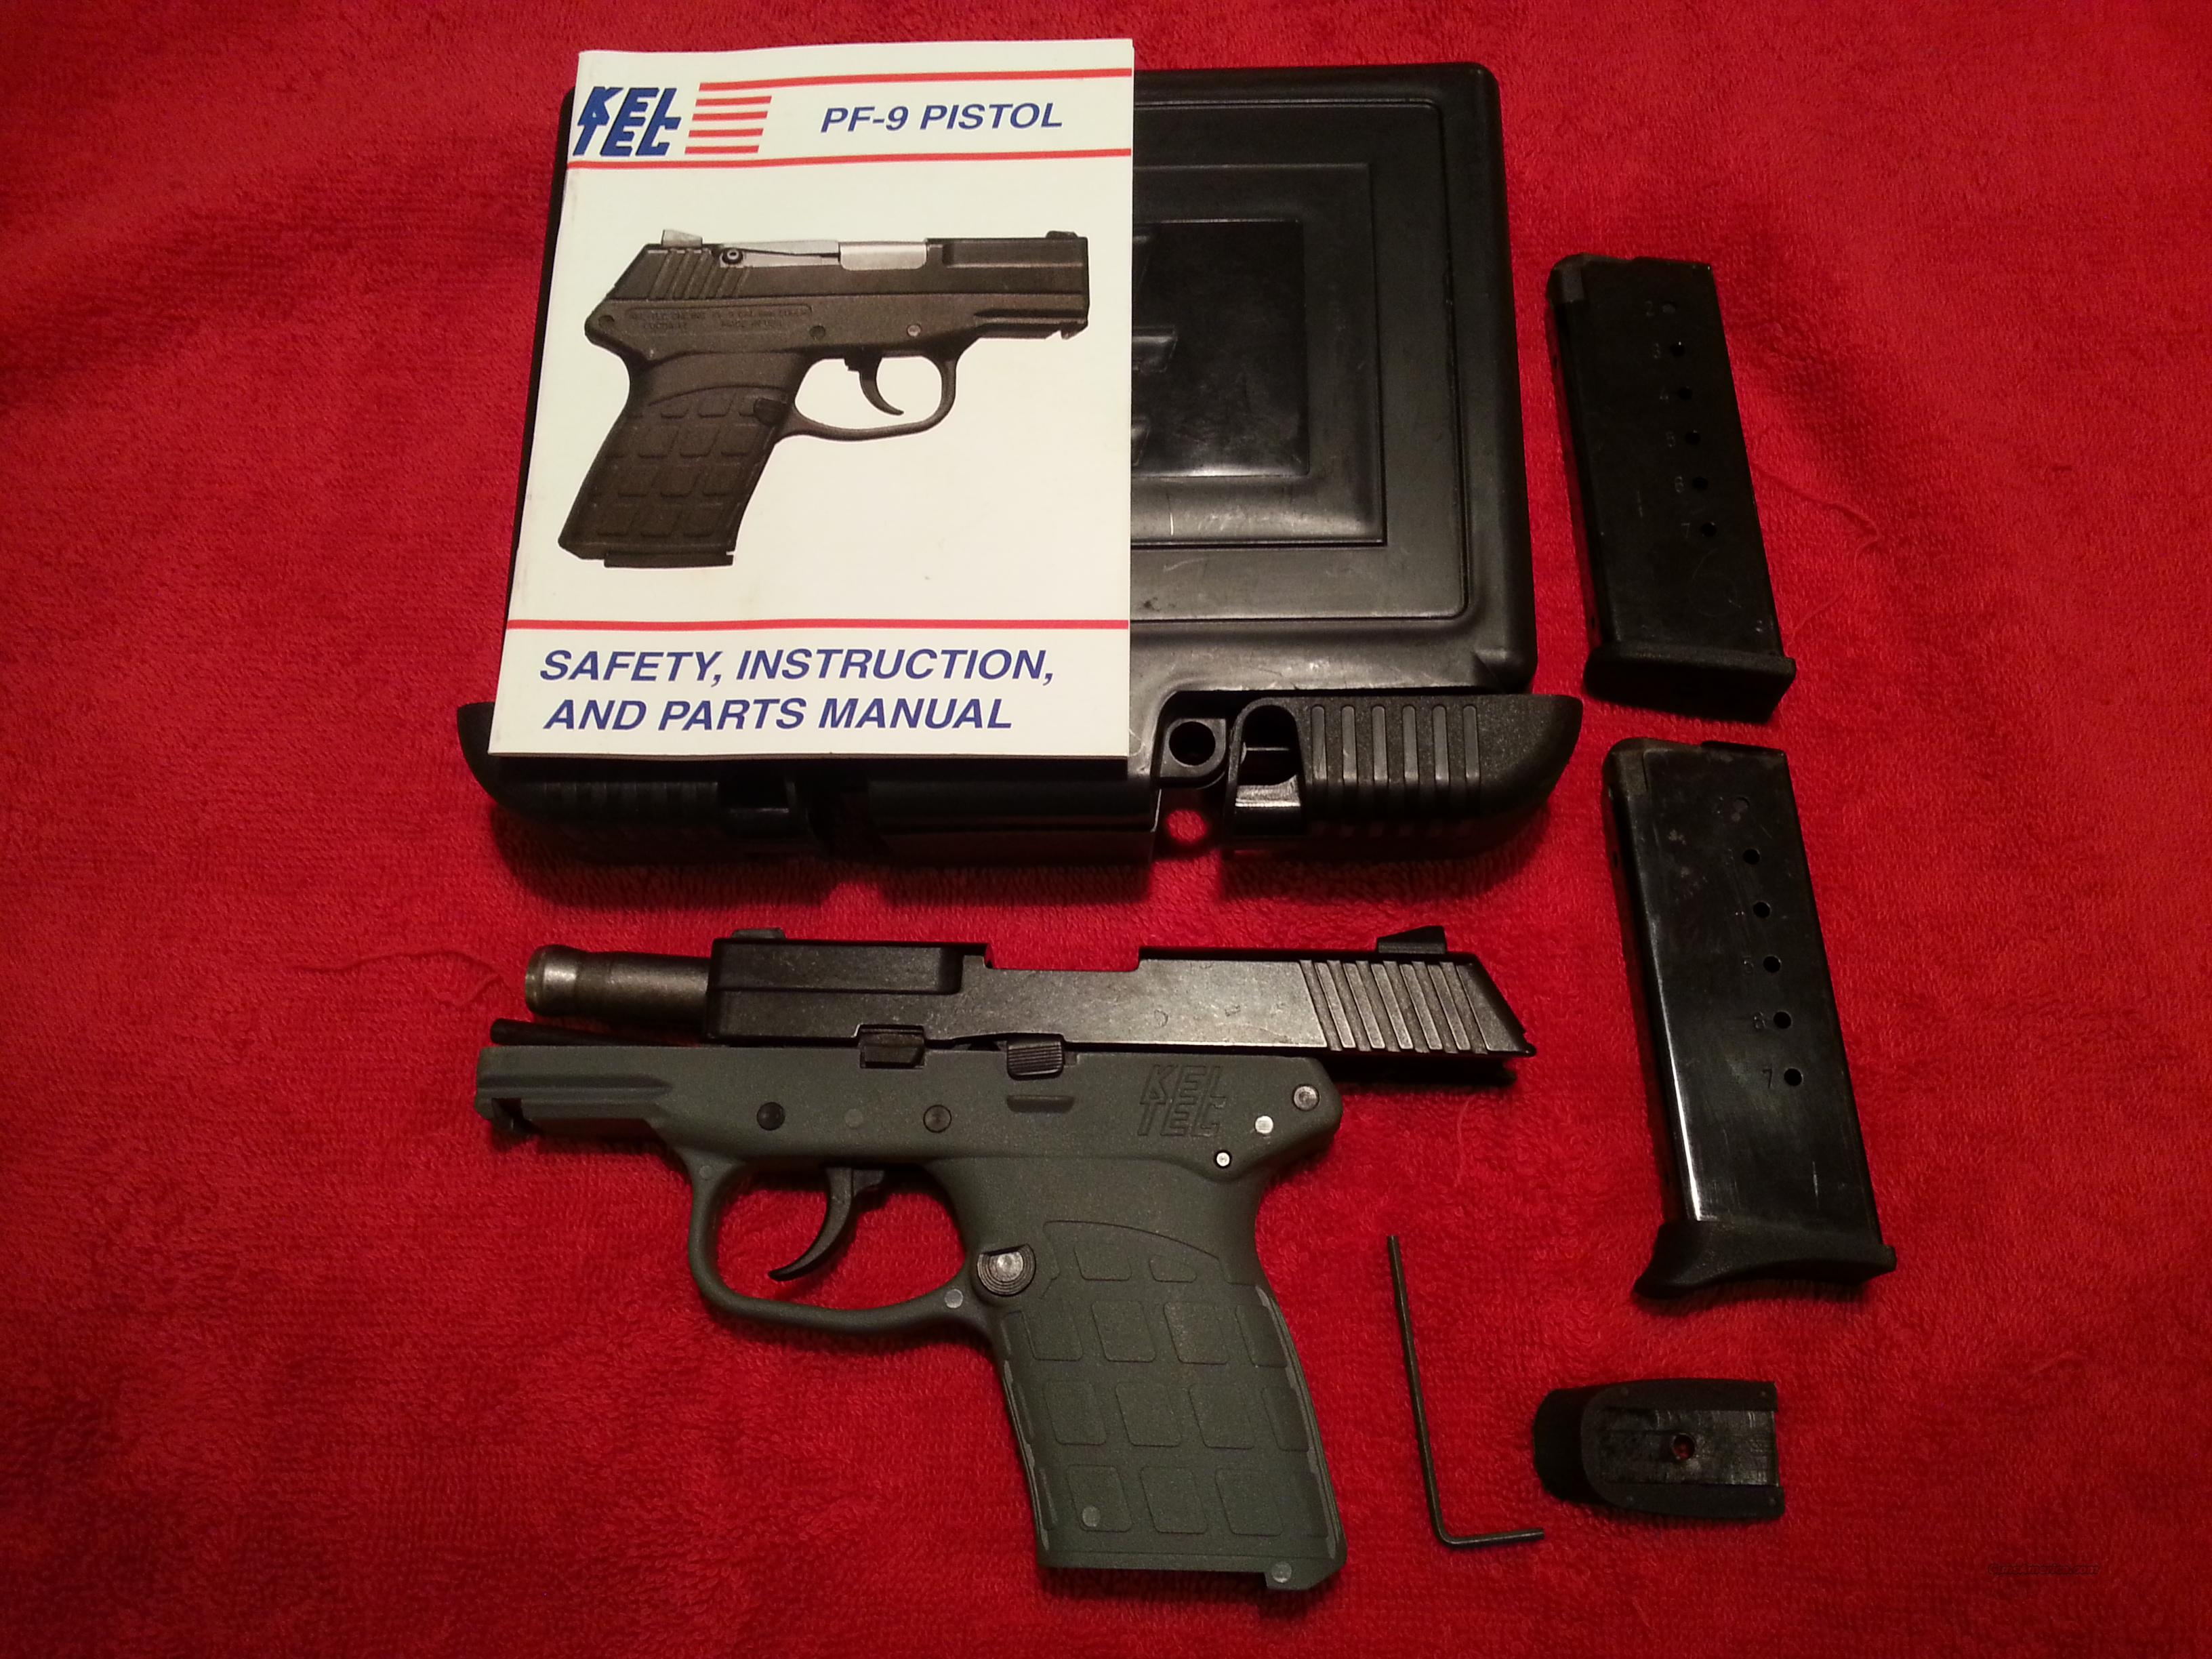 kel tec pf 9 kel tec pf9 keltec pf9 for sale rh gunsamerica com kel tec pf 9 instruction manual kel tec pf9 owners manual pdf